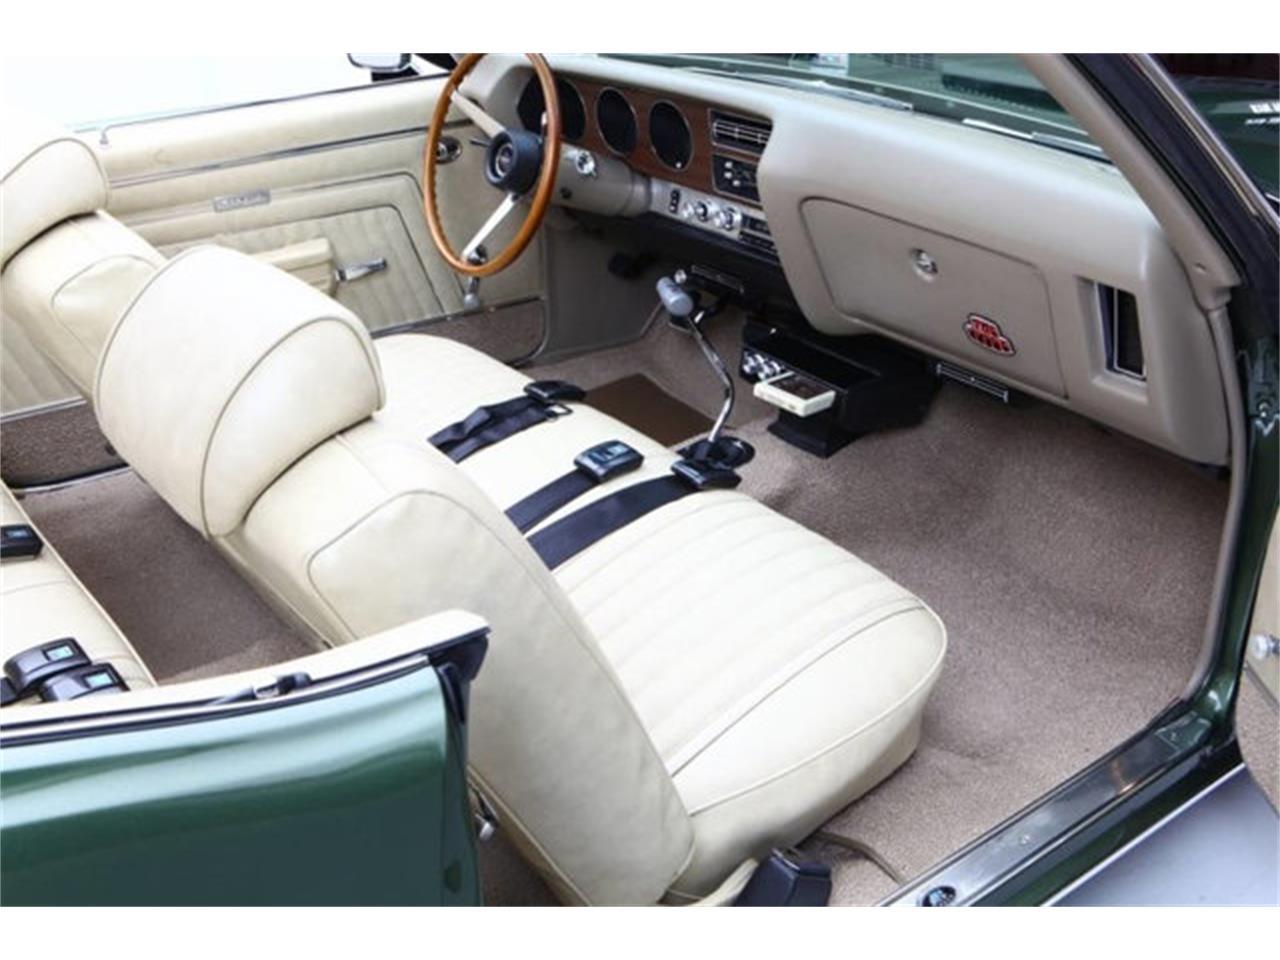 1970 Pontiac GTO (The Judge) (CC-1230740) for sale in Clifton Park, New York